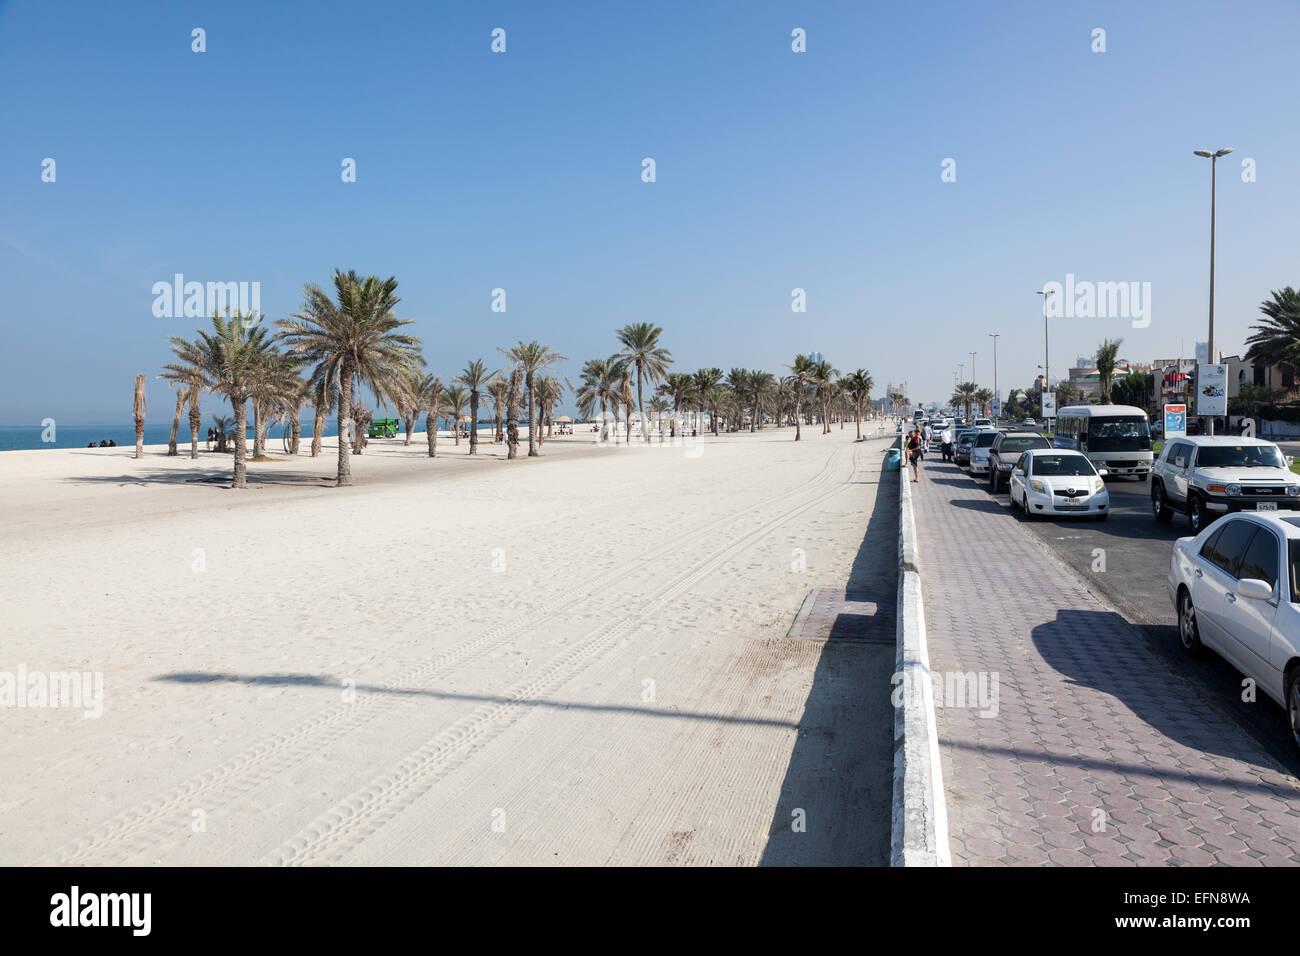 Fish aquarium in umm al quwain - Beach And Corniche In Umm Al Quwain Stock Image